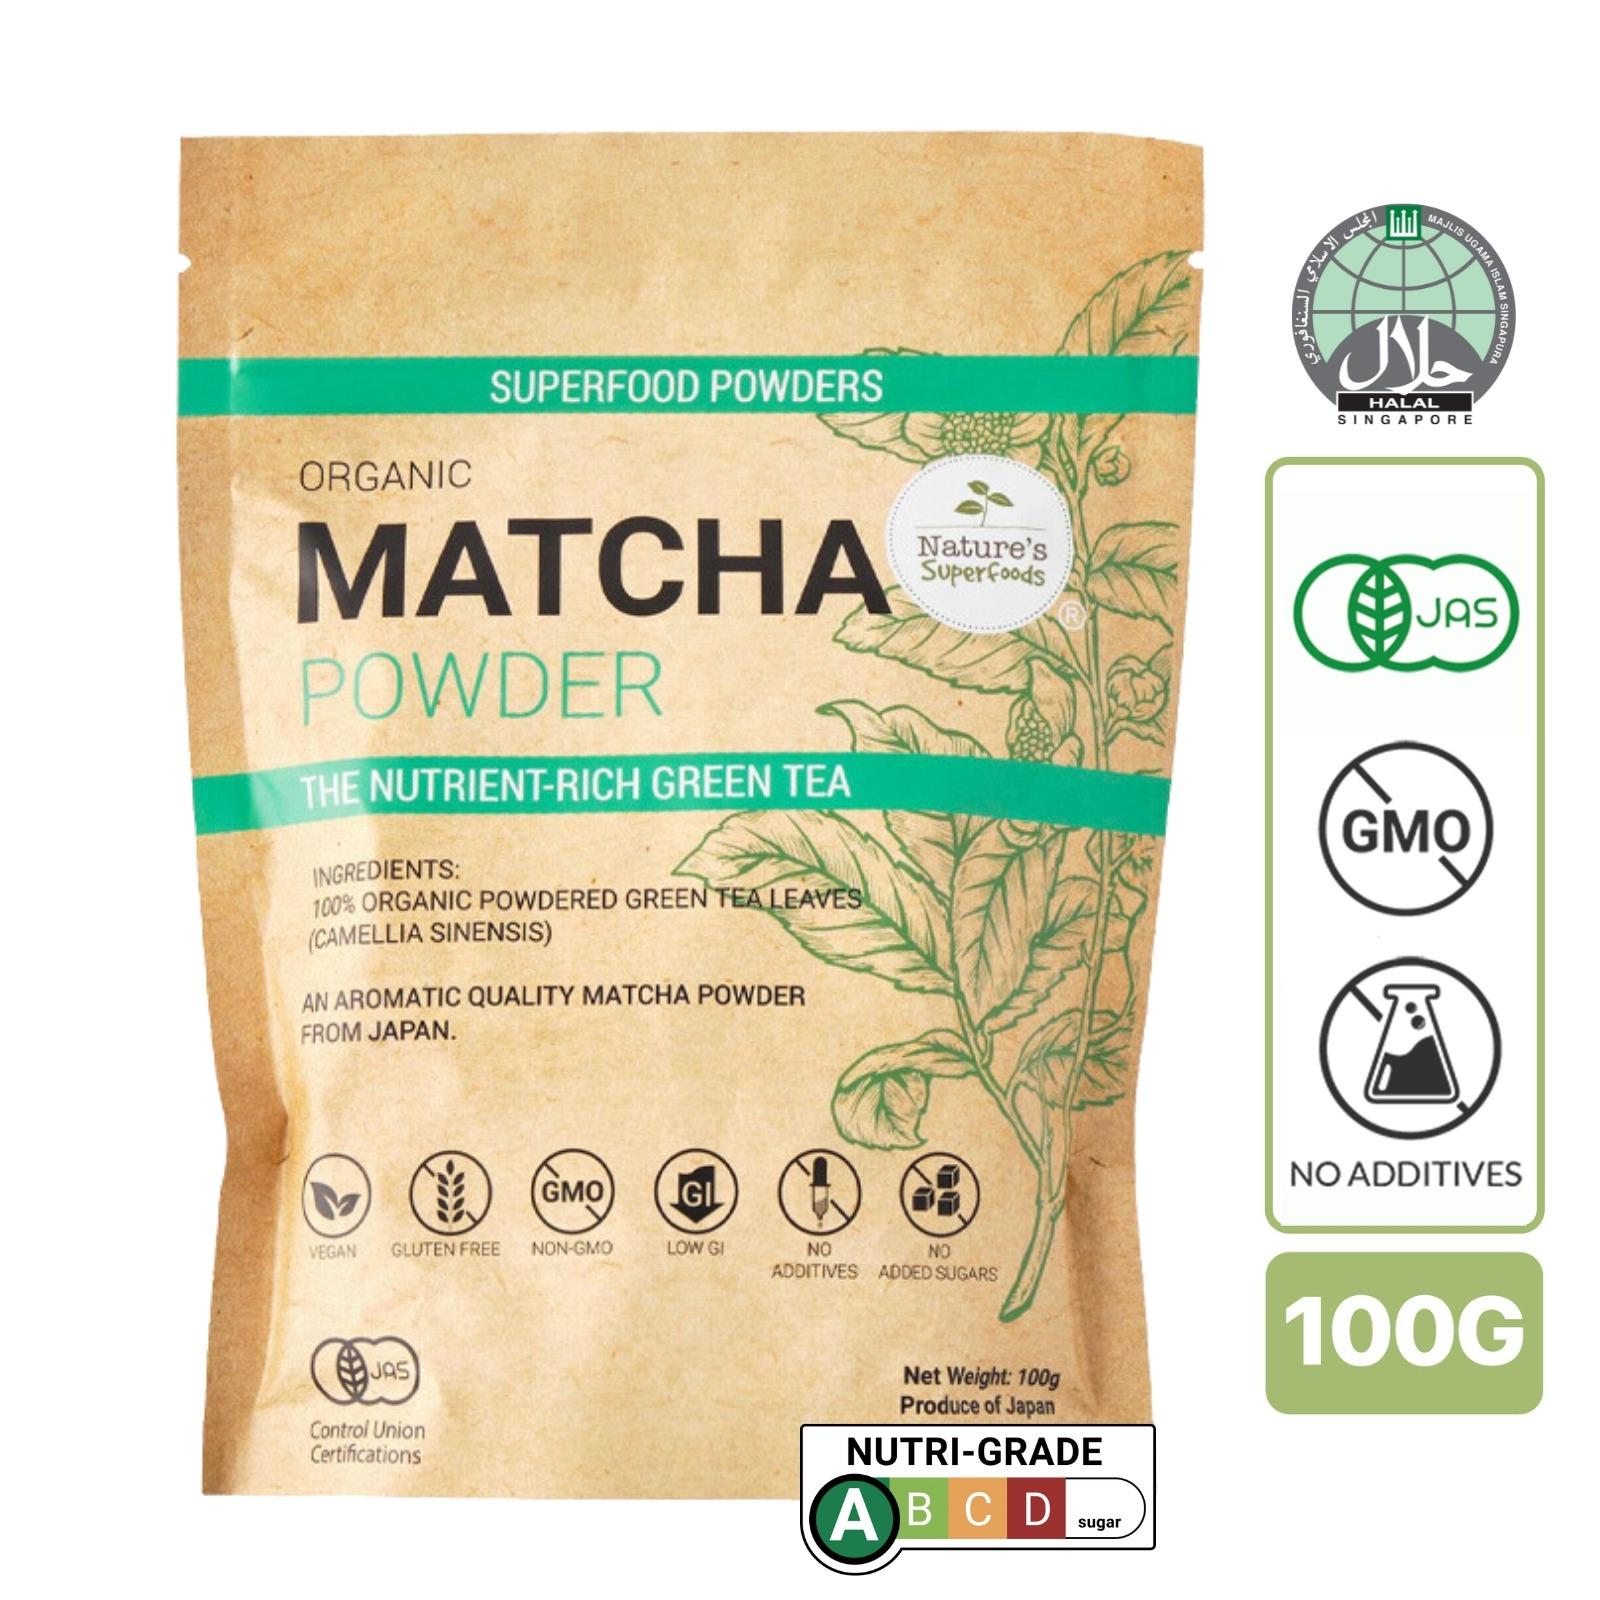 Nature's Superfoods Organic Premium Matcha Powder - For Tea